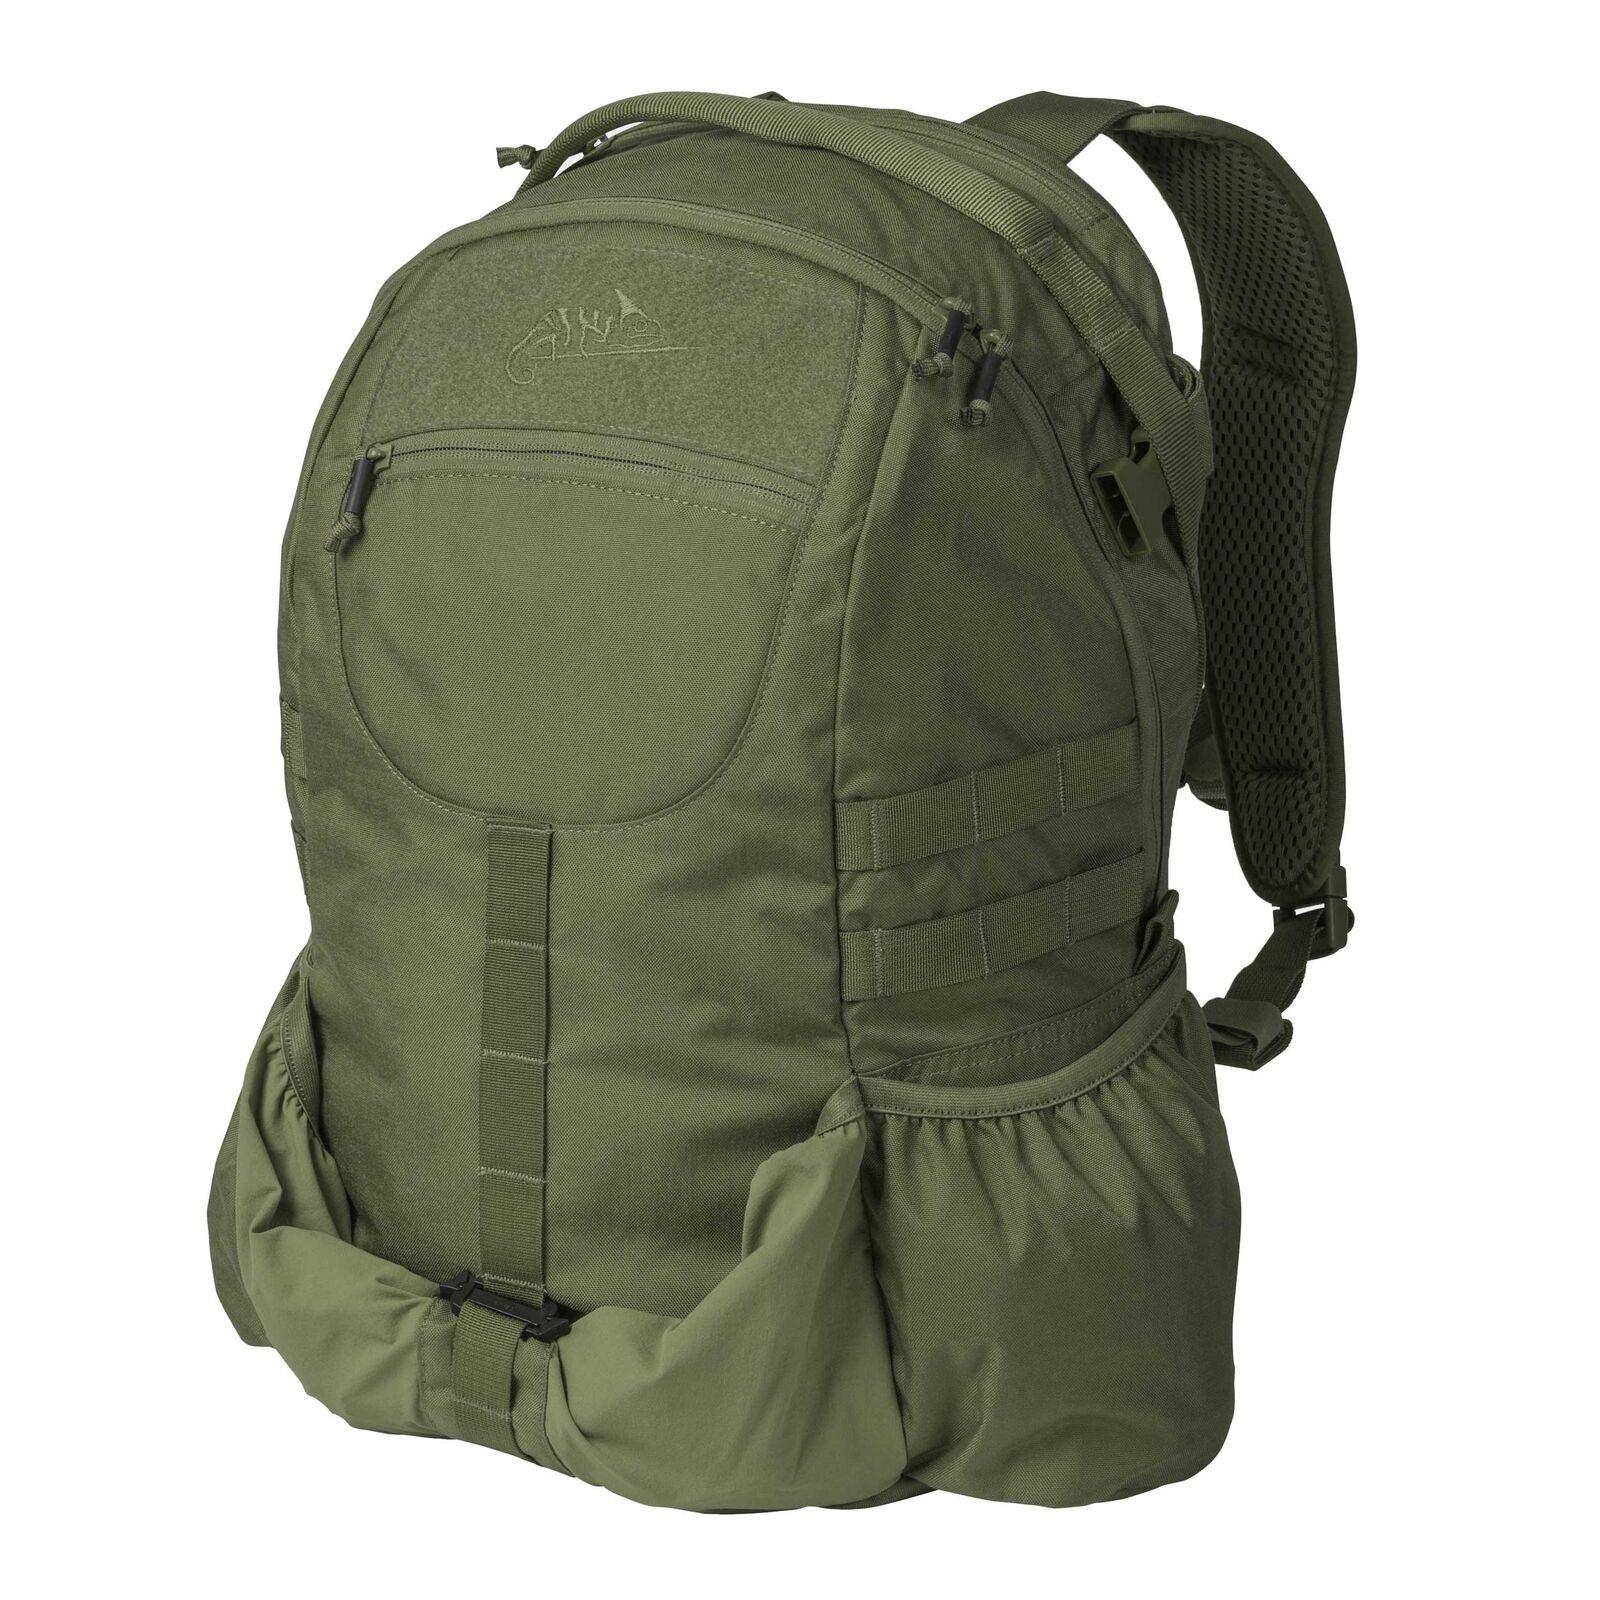 Helikon-Tex Raider Rucksack Oliv Grün Backpack 20 Liter